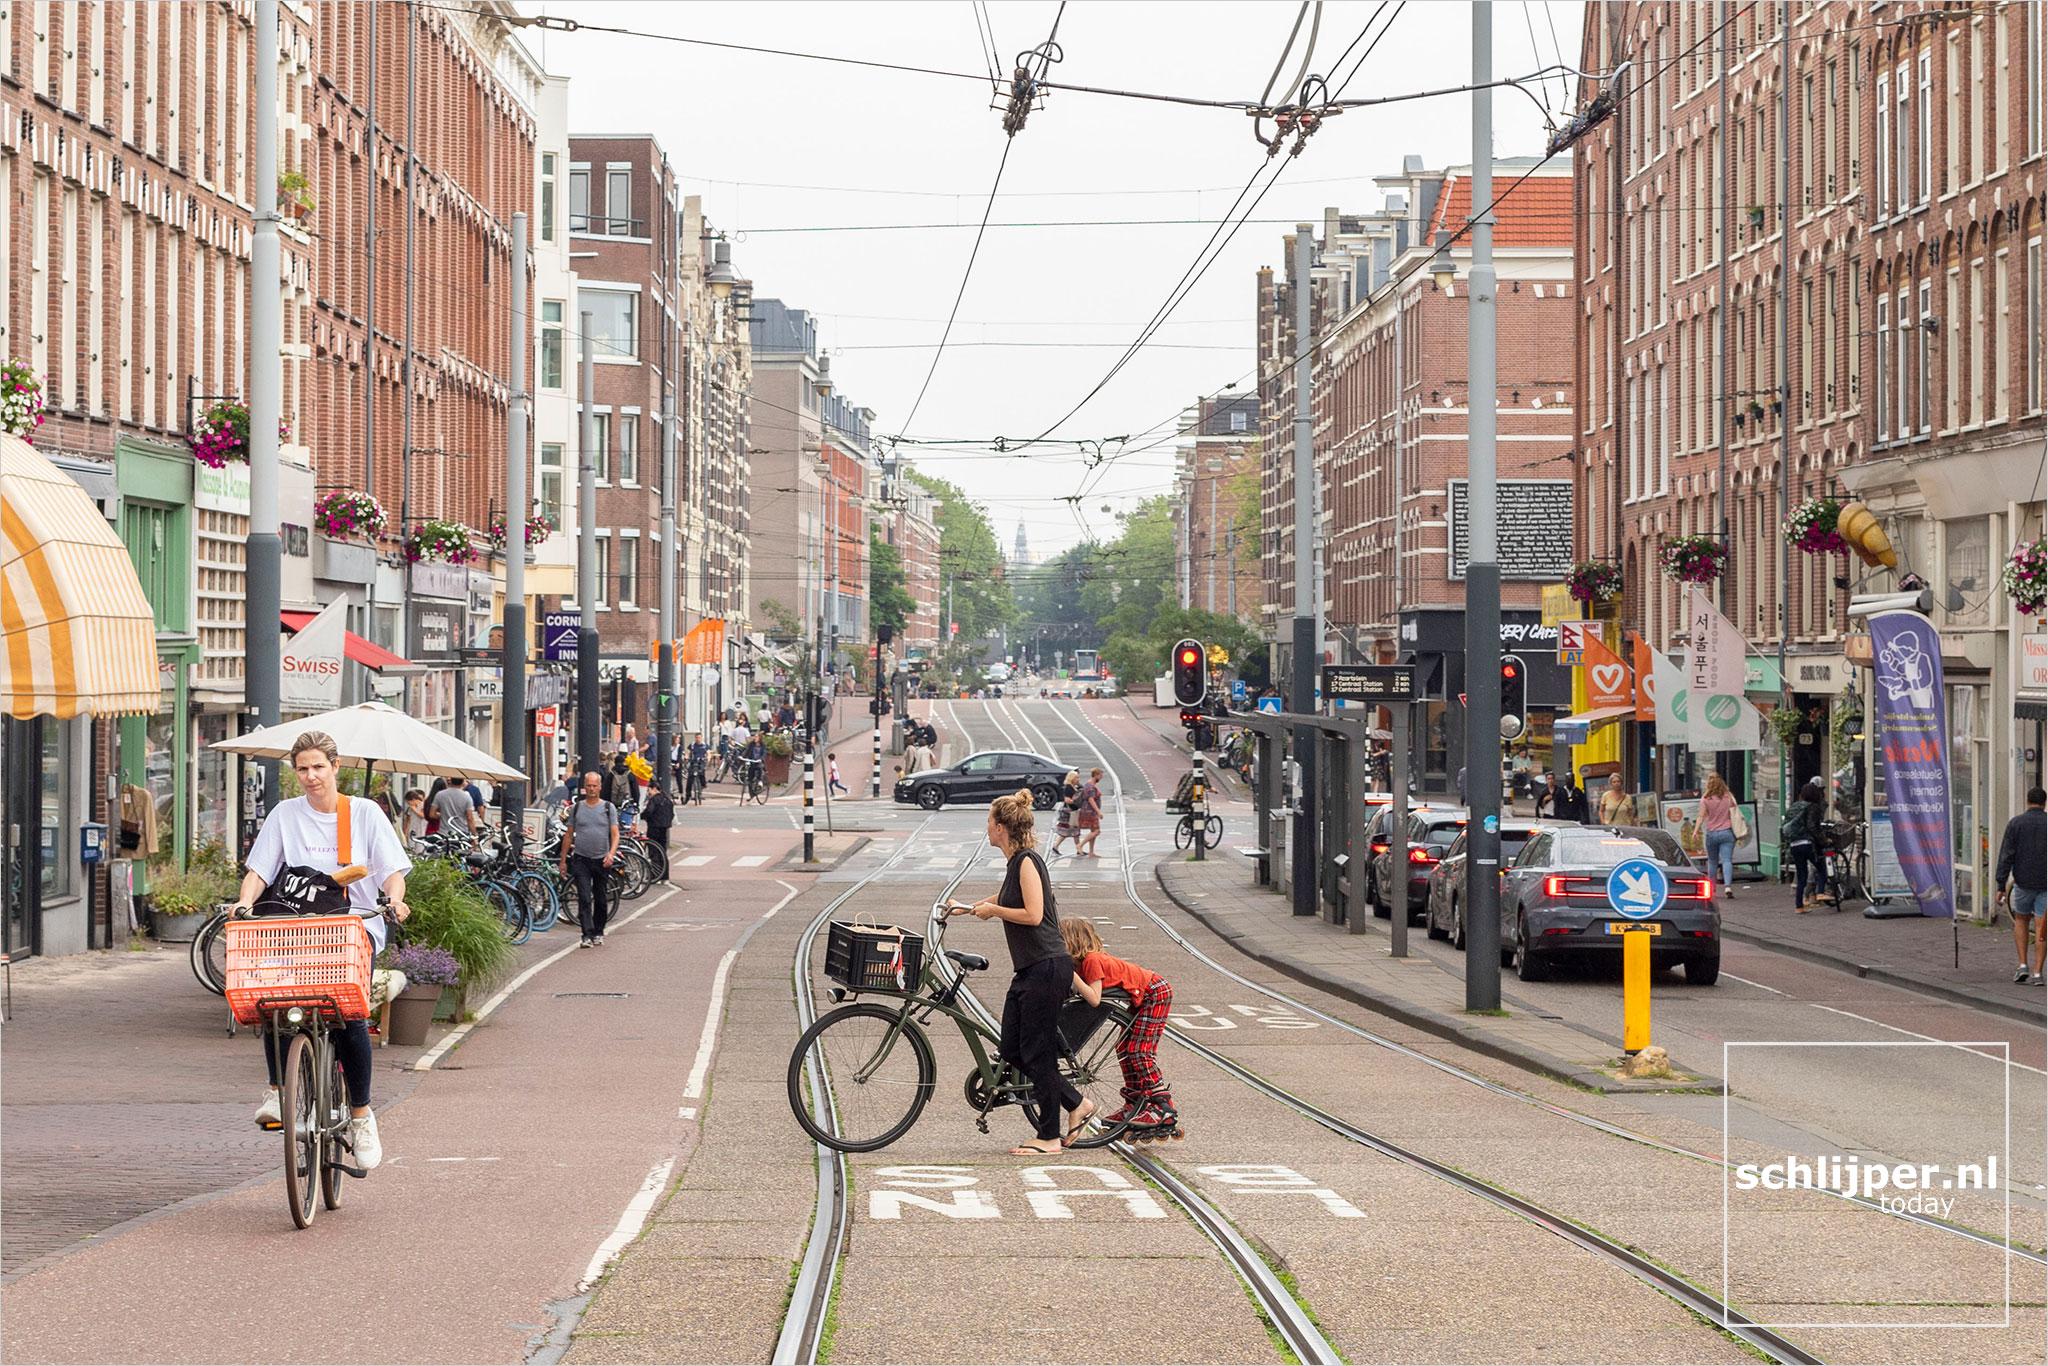 The Netherlands, Amsterdam, 10 juli 2021